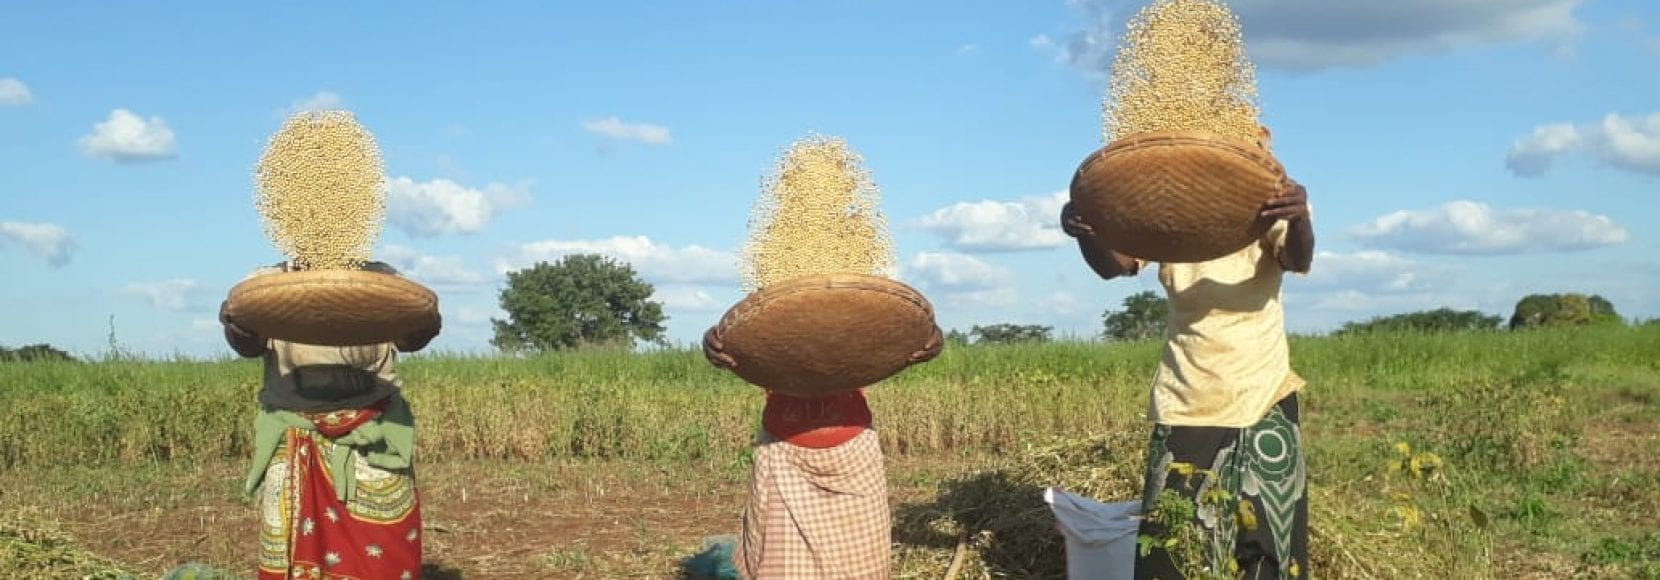 Three farmers tossing their soybean crops